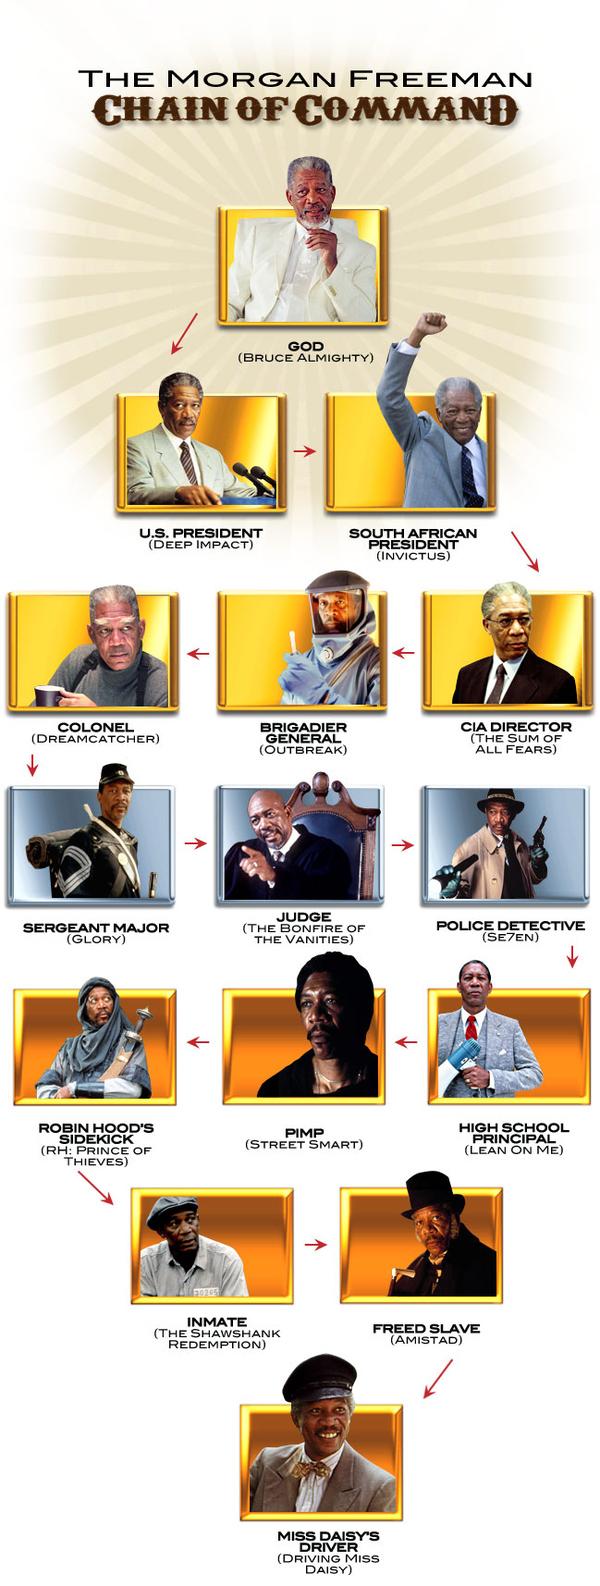 The Morgan Freeman Chain of Command